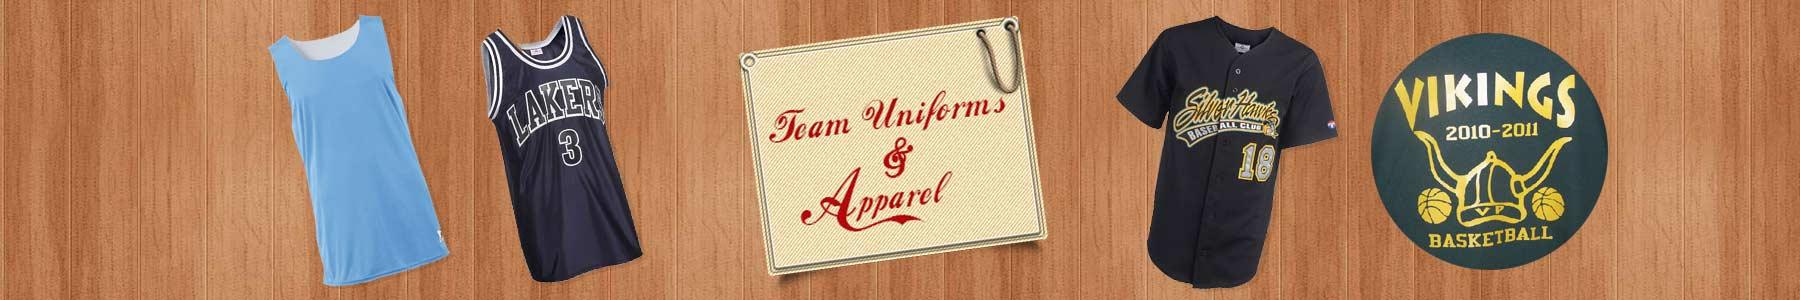 Custom Team Uniforms-Screen Printed Apparel